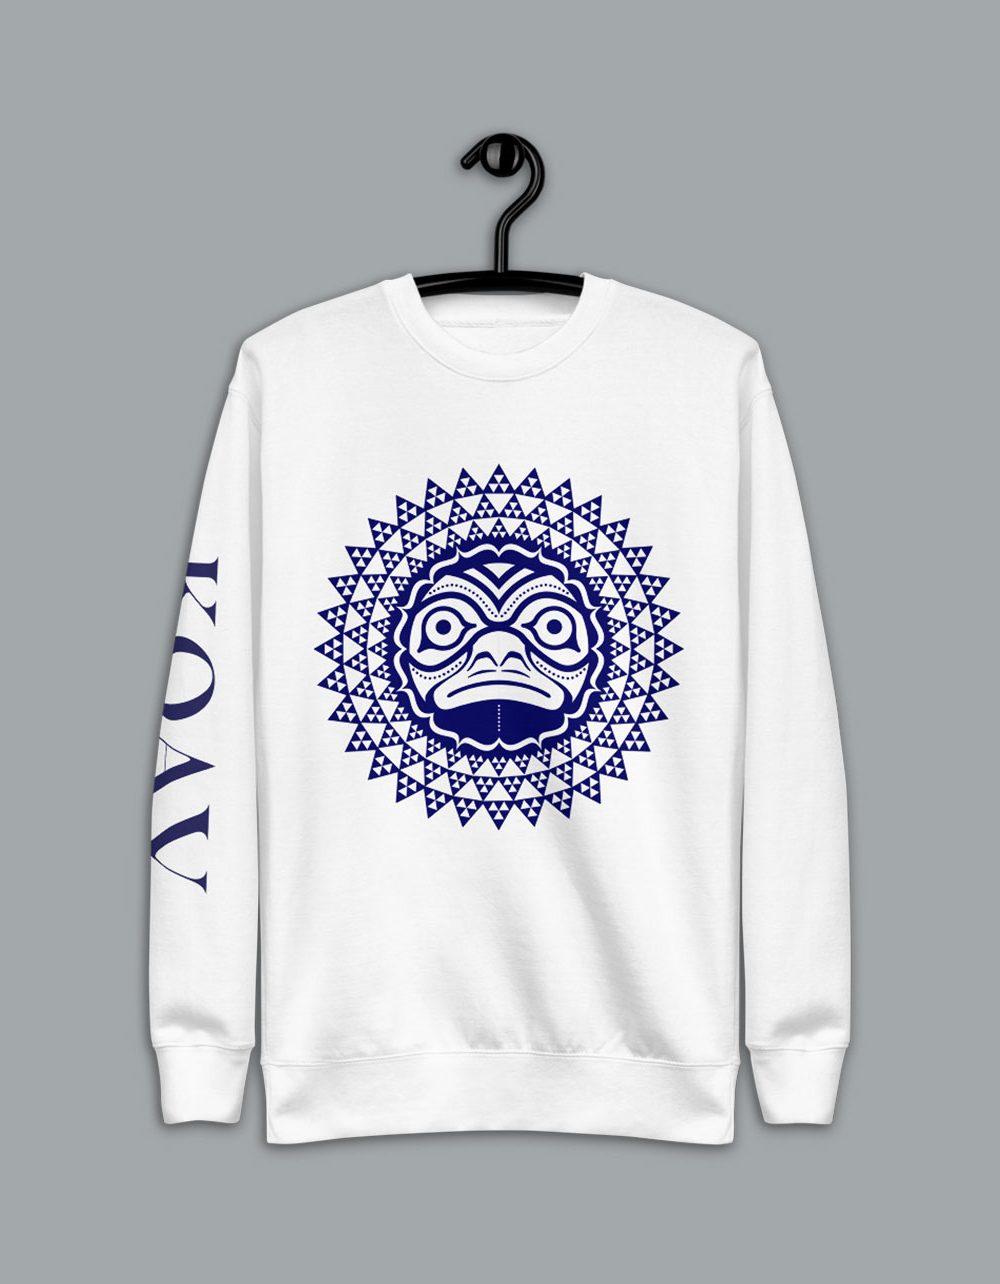 Turtle Kuleana premium fleece pullover sweater by KOAV